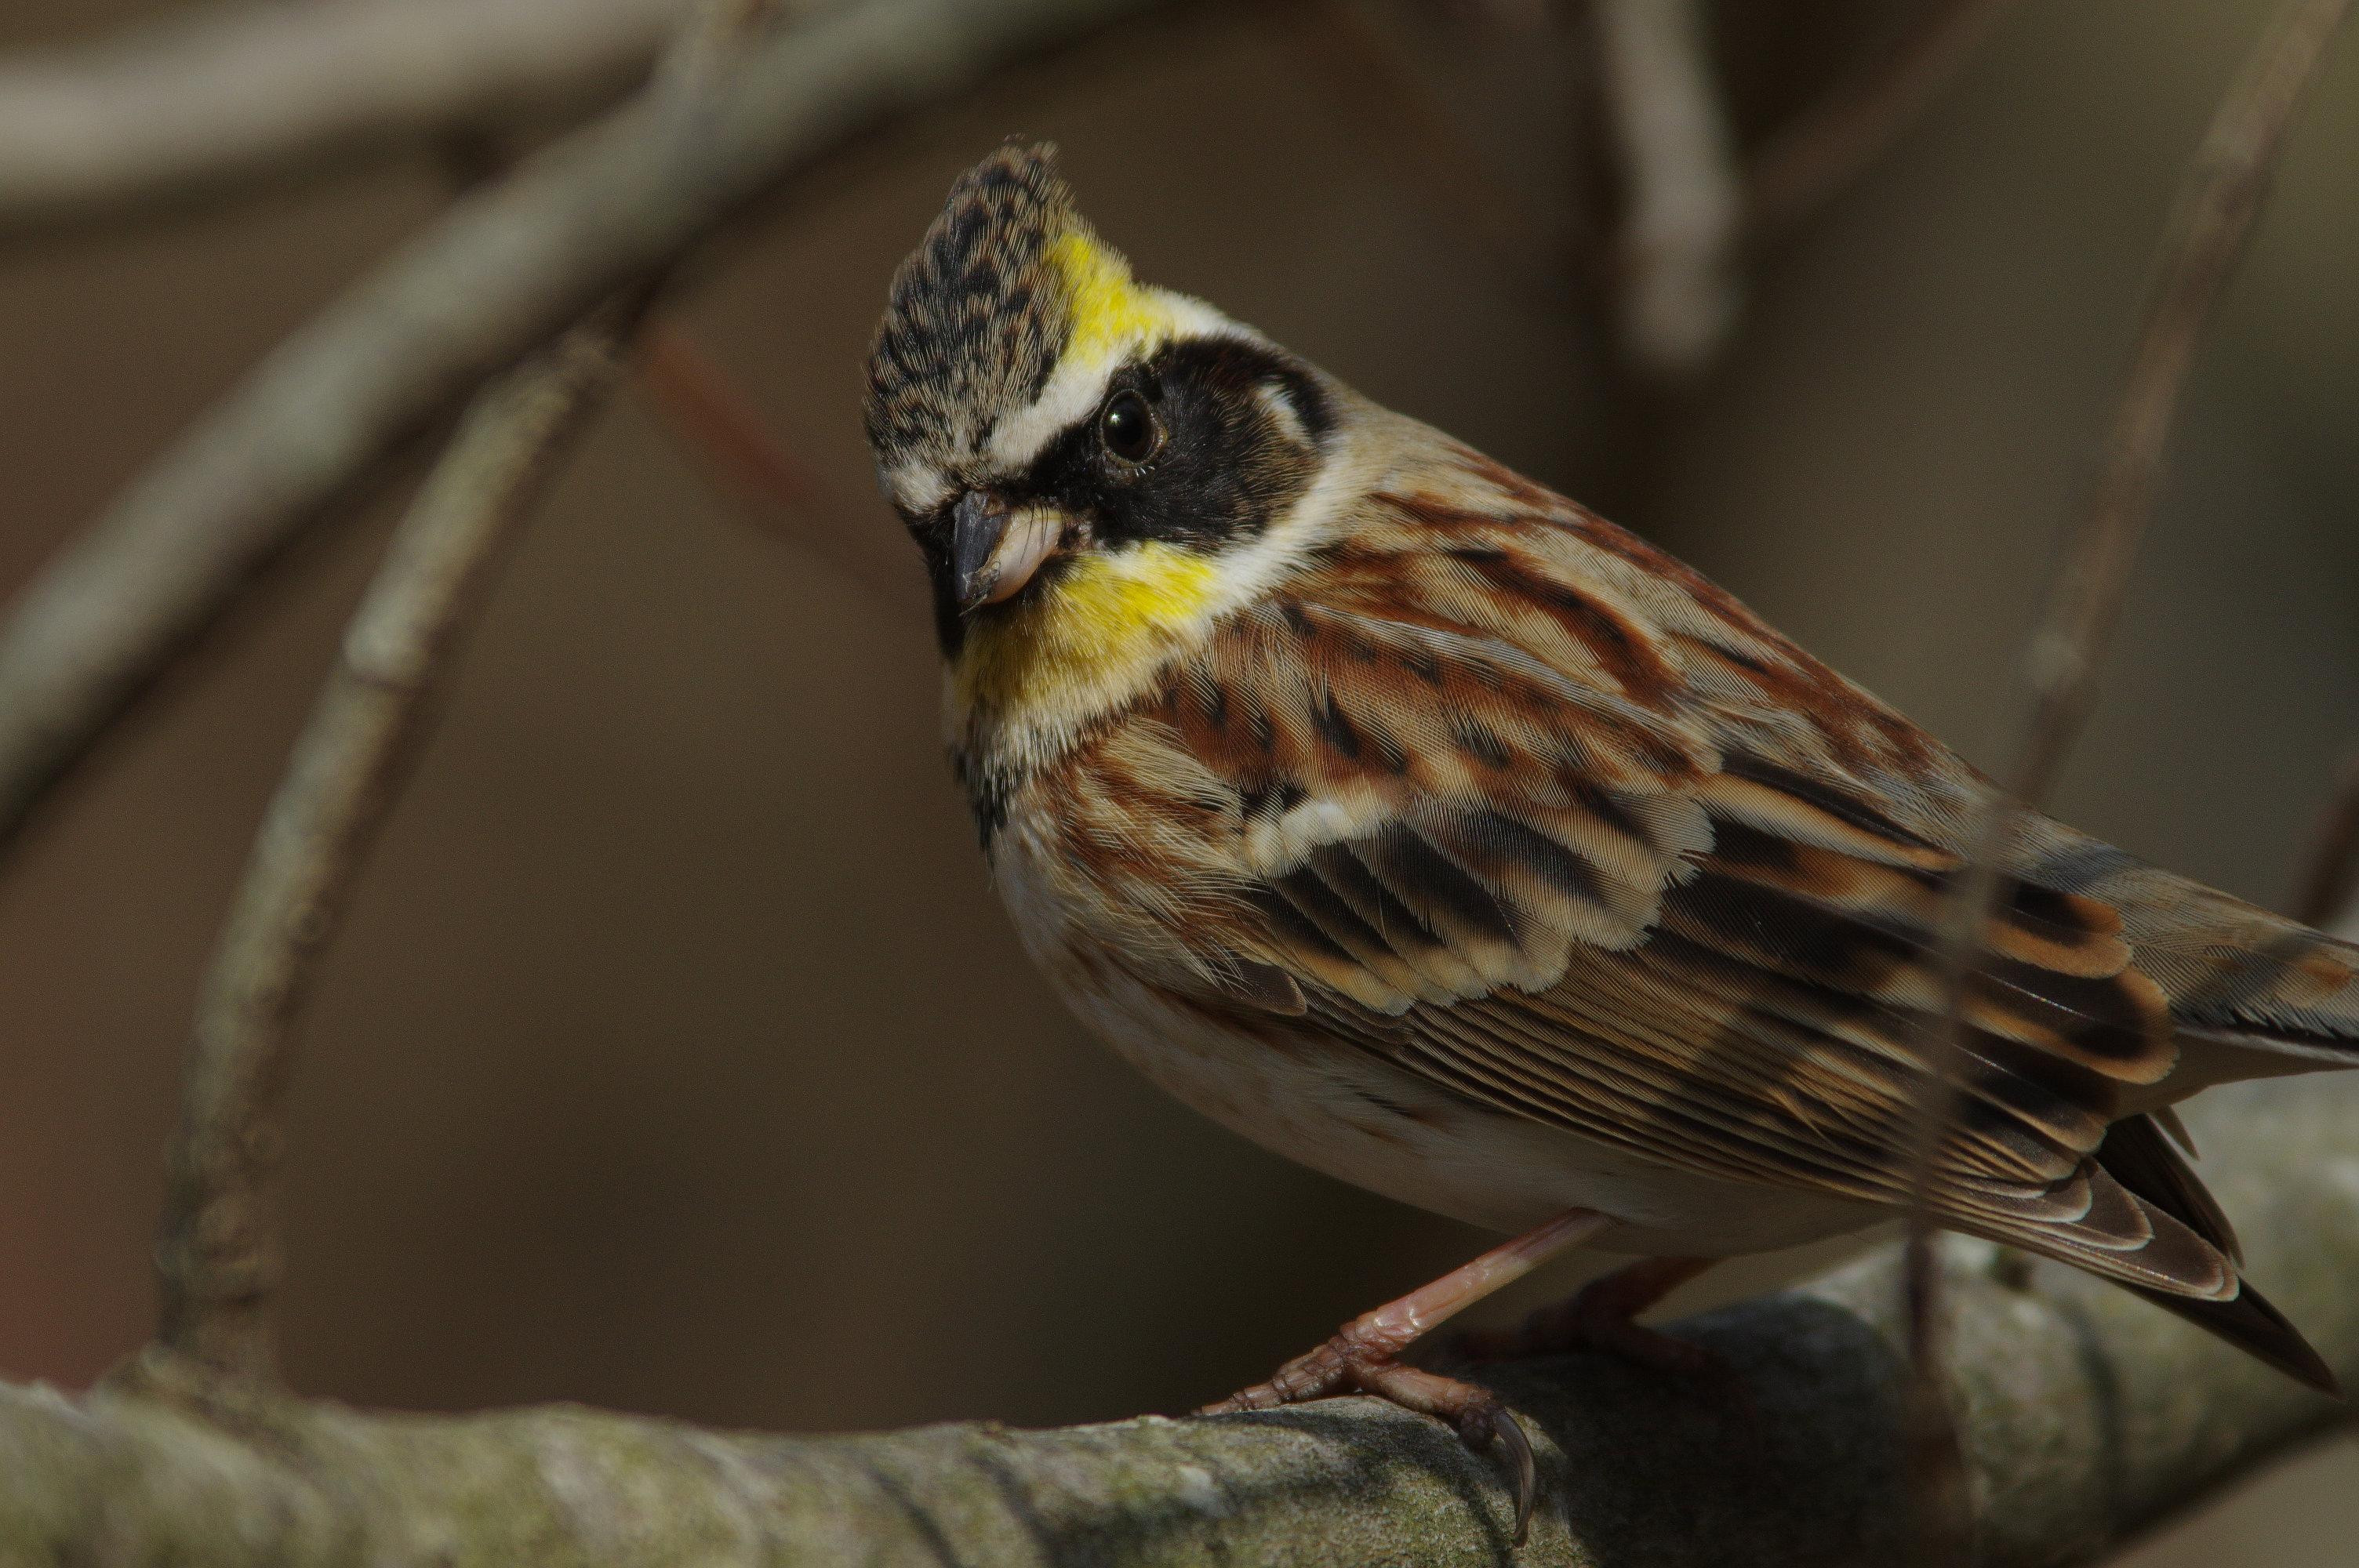 AFボーグ BORG90FLで撮影した野鳥・ミヤマホオジロの写真画像